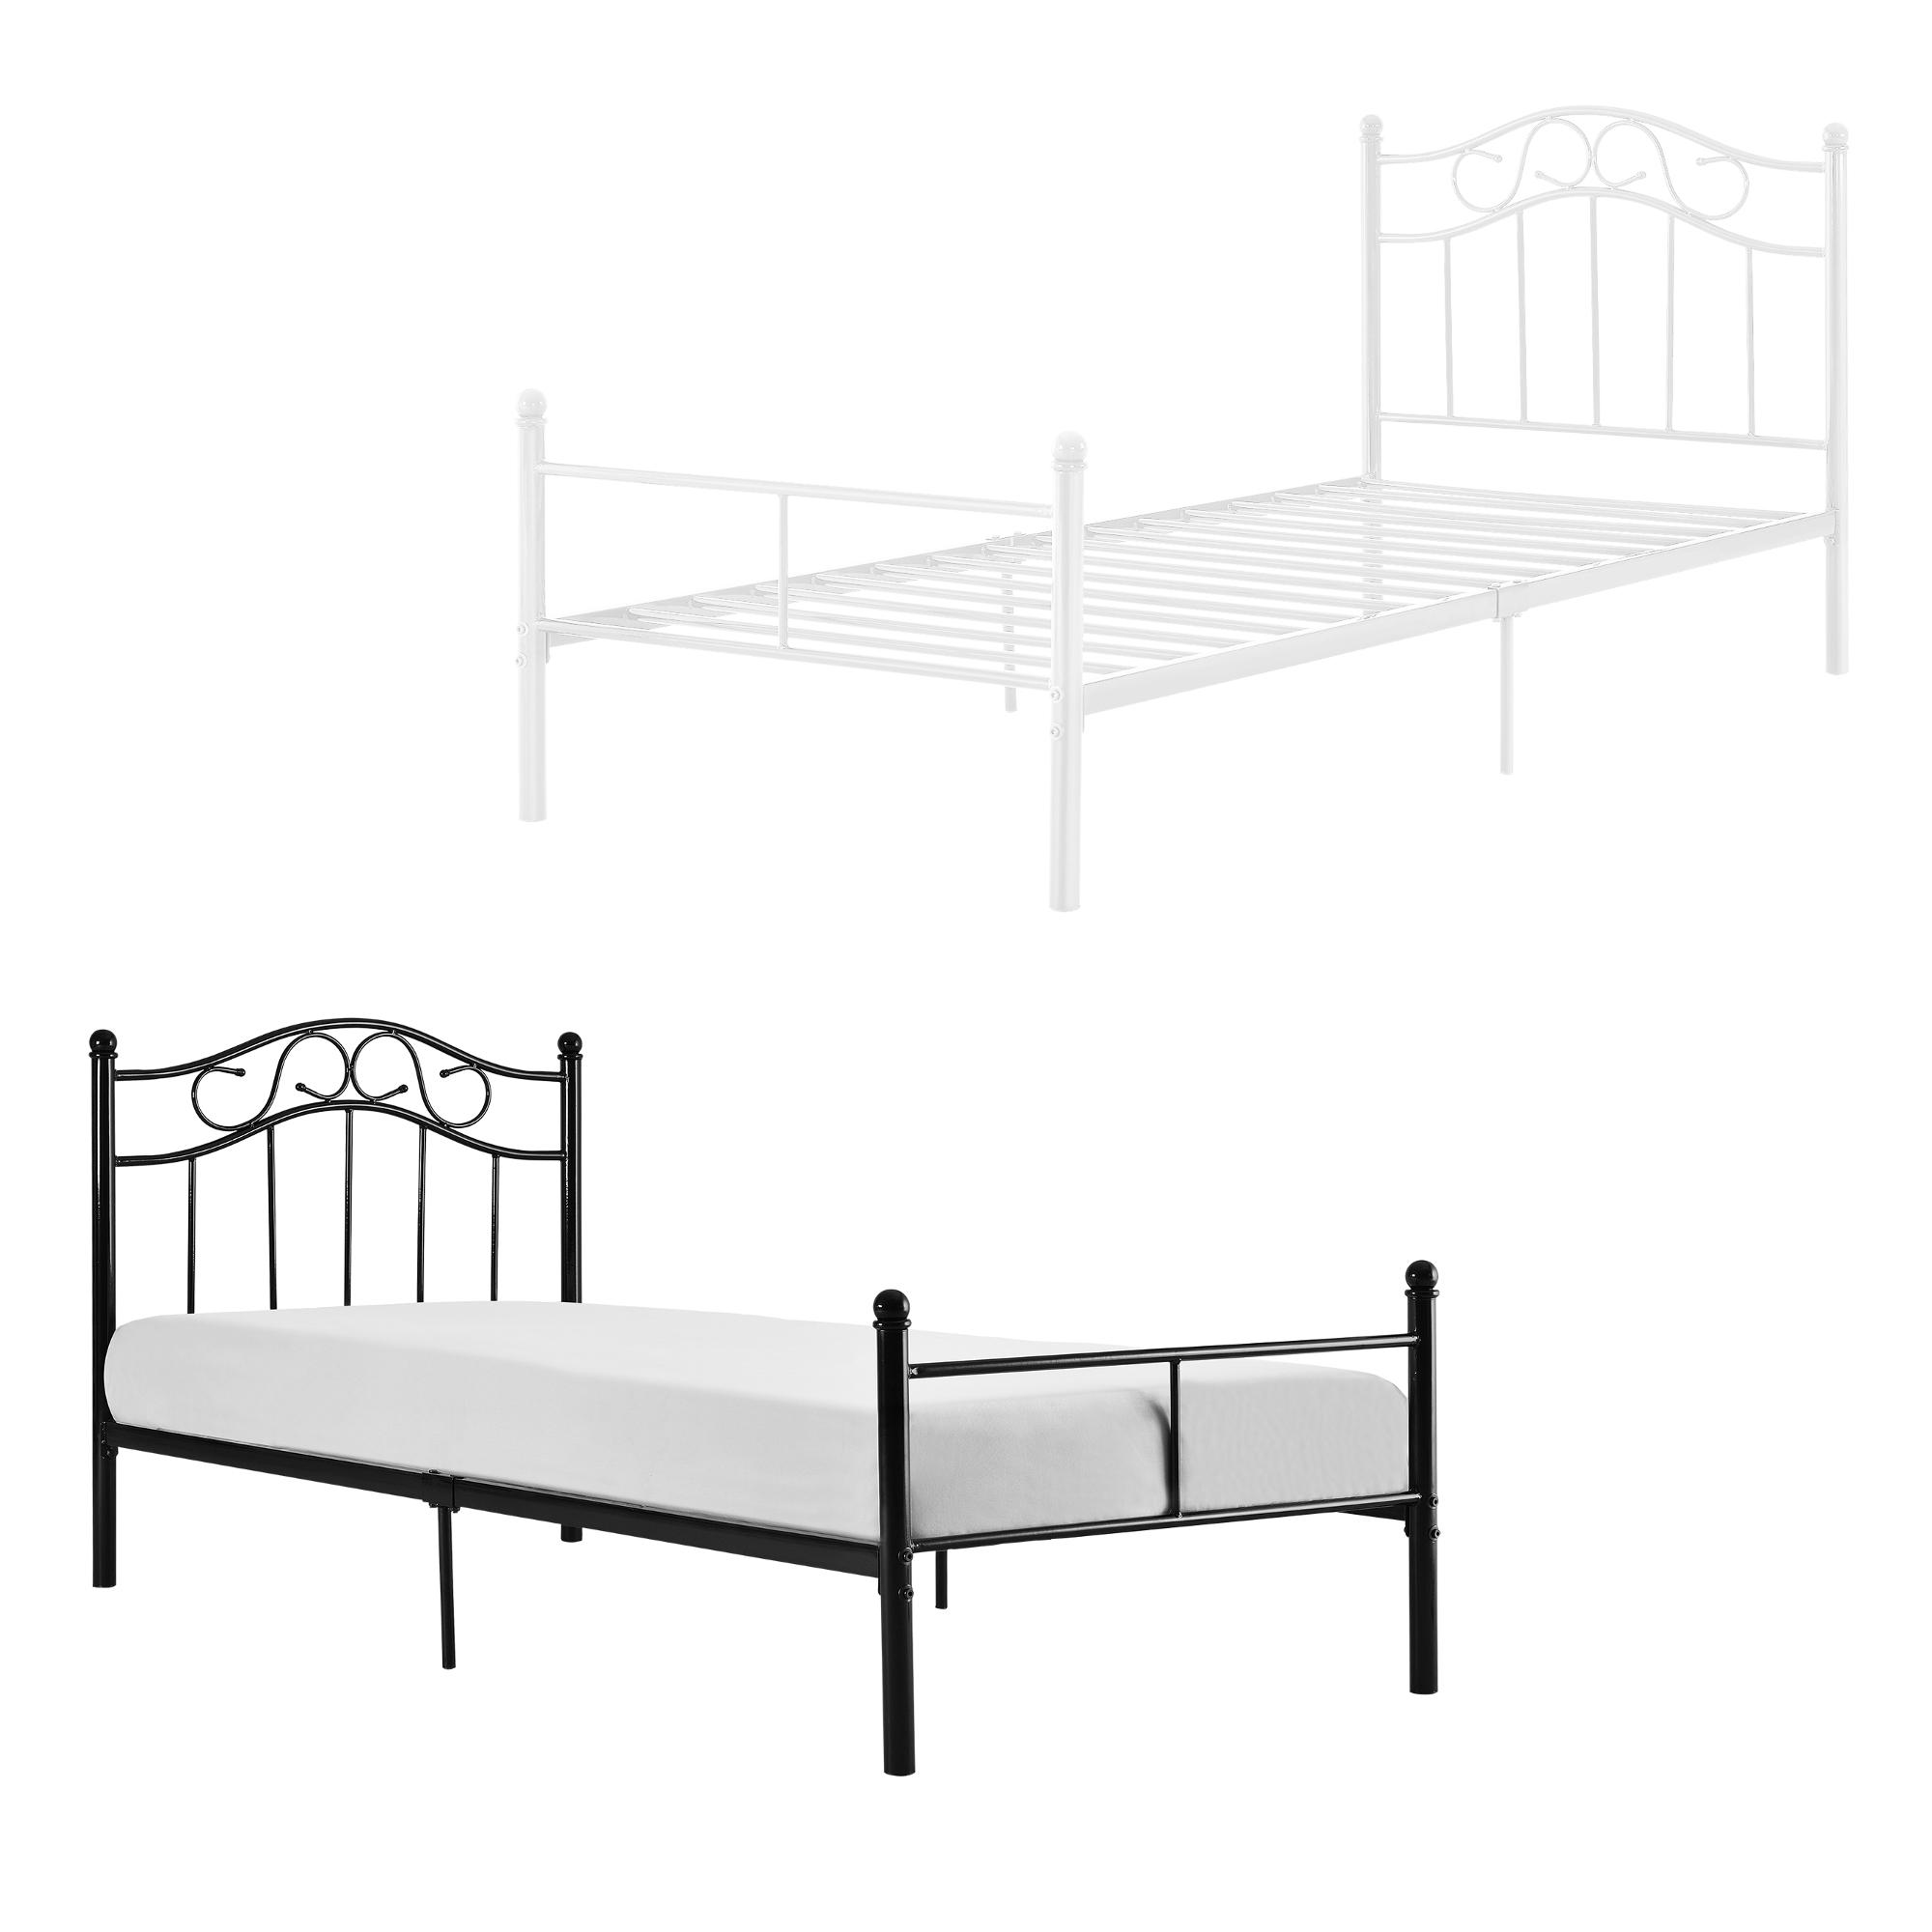 metallbett 90 120 140 180 200x200 bett. Black Bedroom Furniture Sets. Home Design Ideas